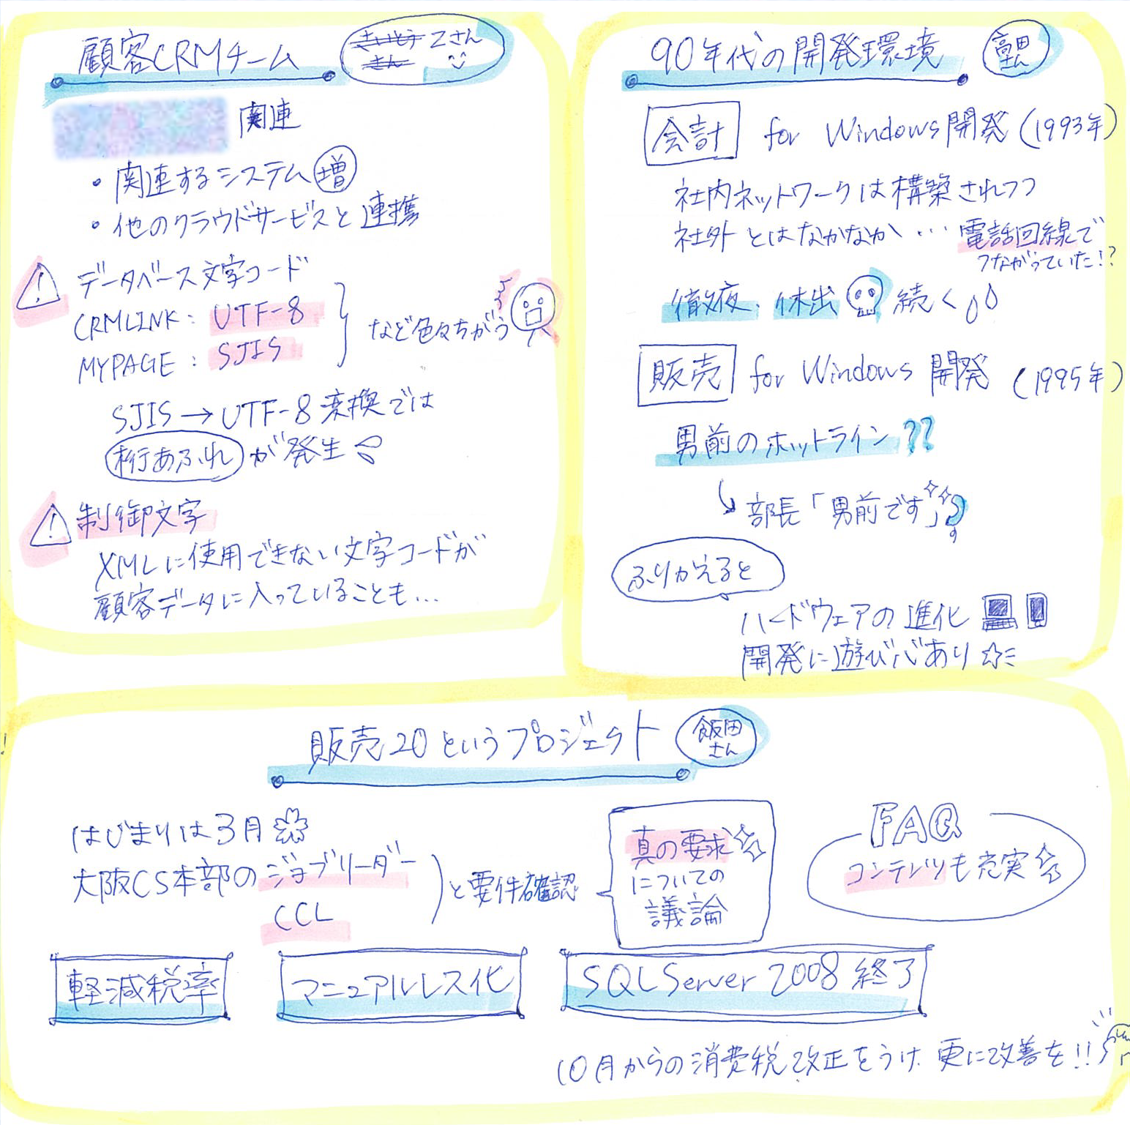 f:id:n_shiori:20191211191941p:plain